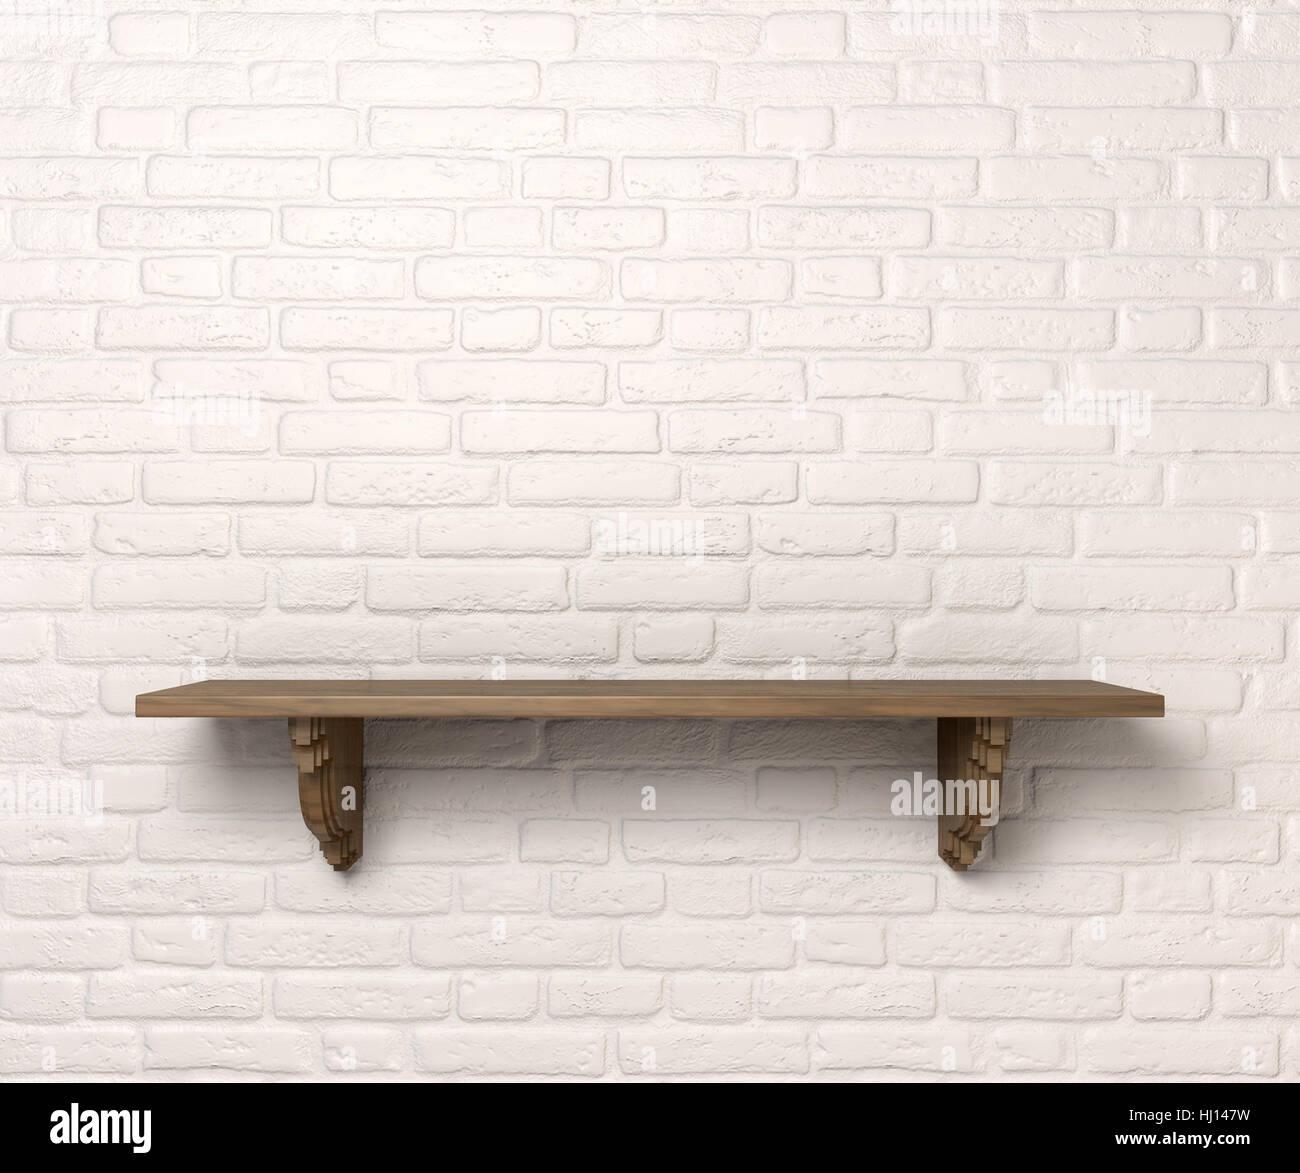 Isoliert Mobel Holz Wand Holz Regal Ledge Halterung Leer